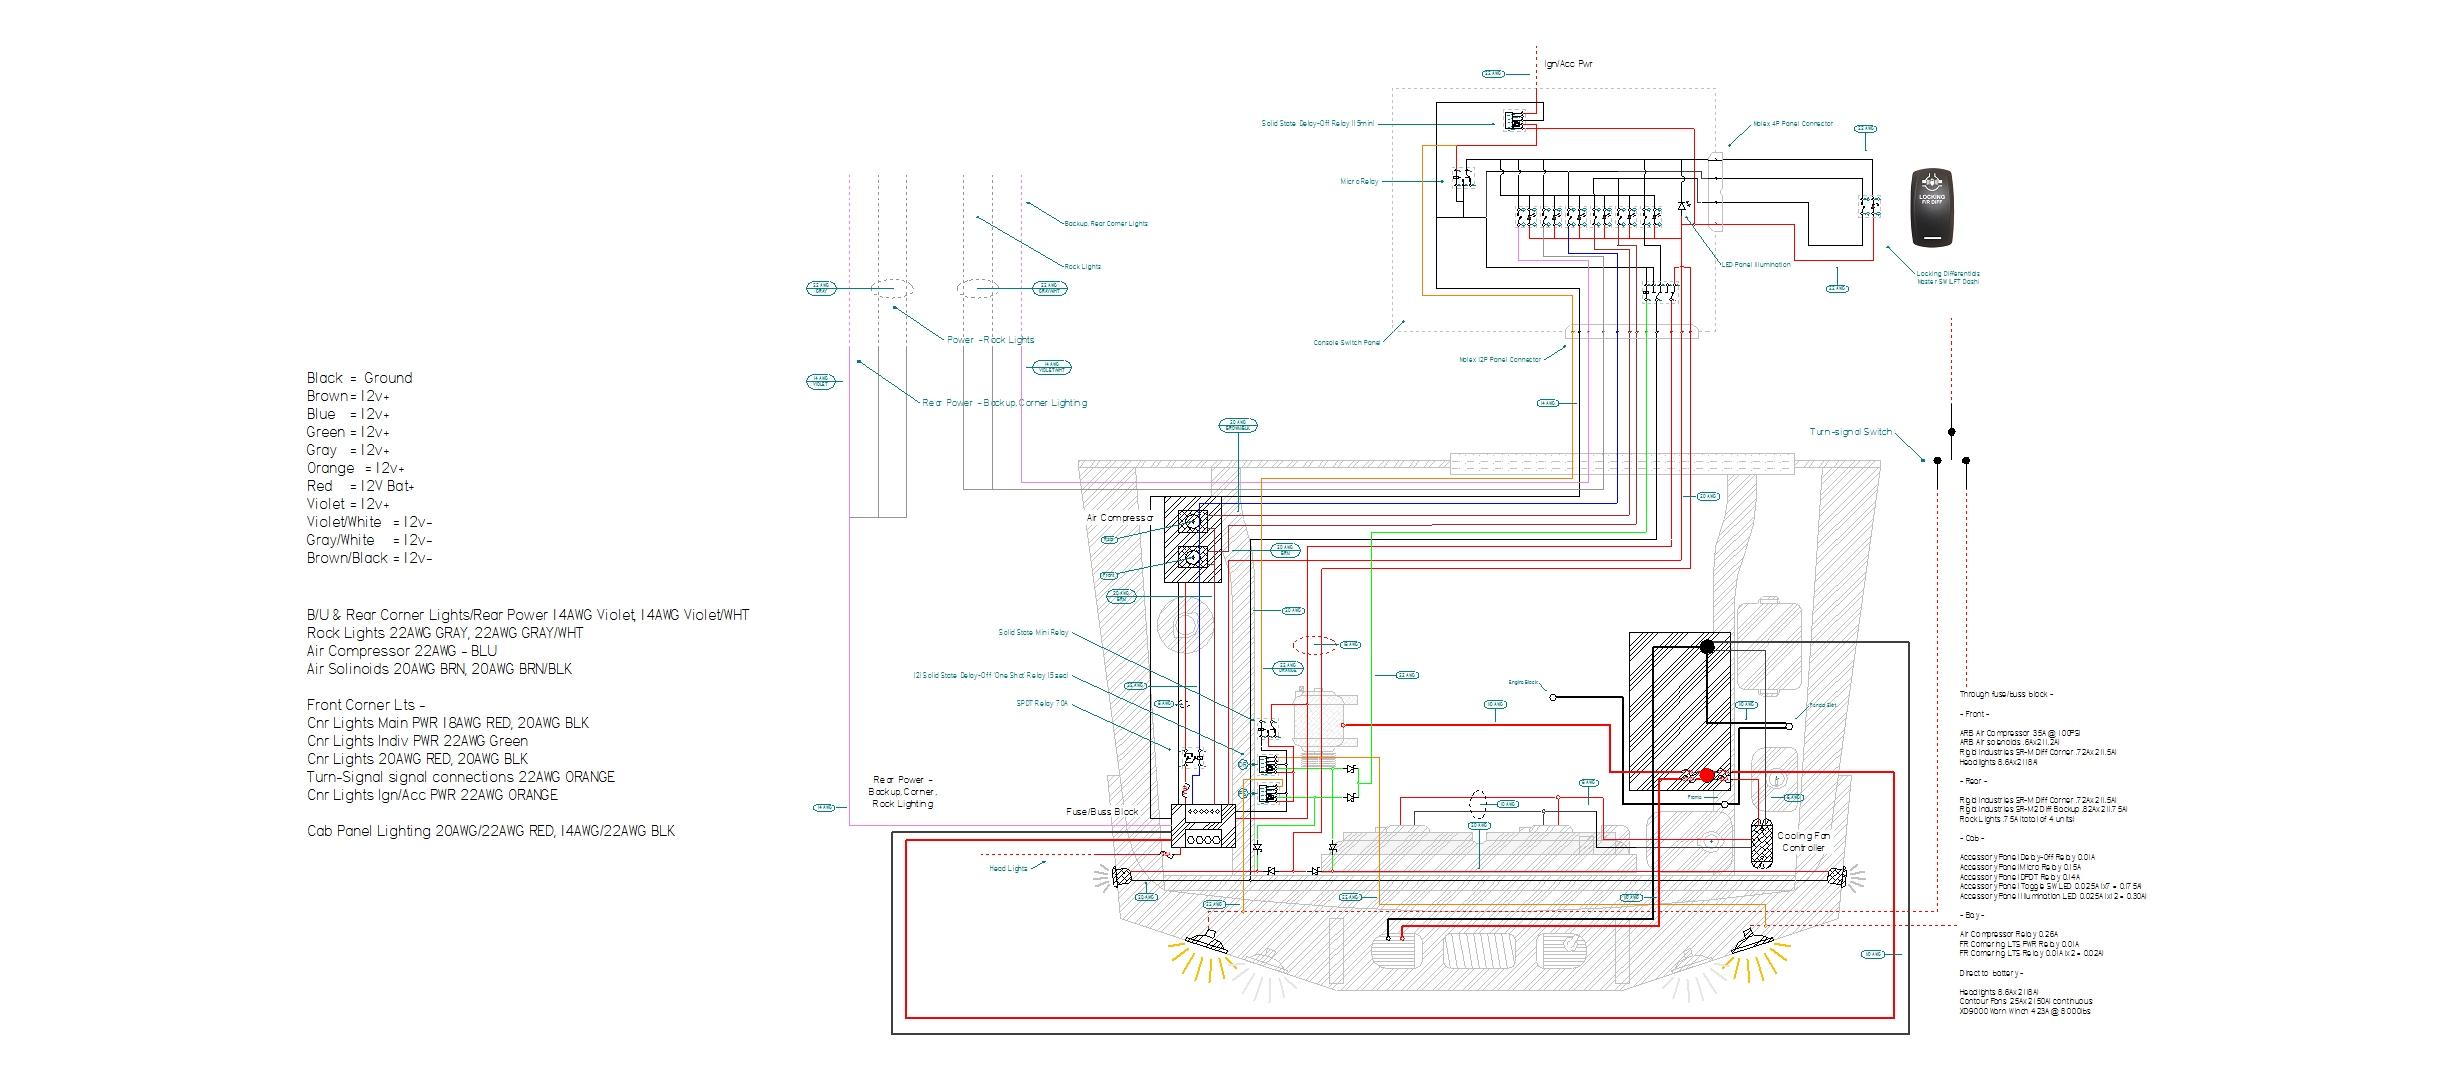 1993 dutchman camper 12 volt wiring diagram